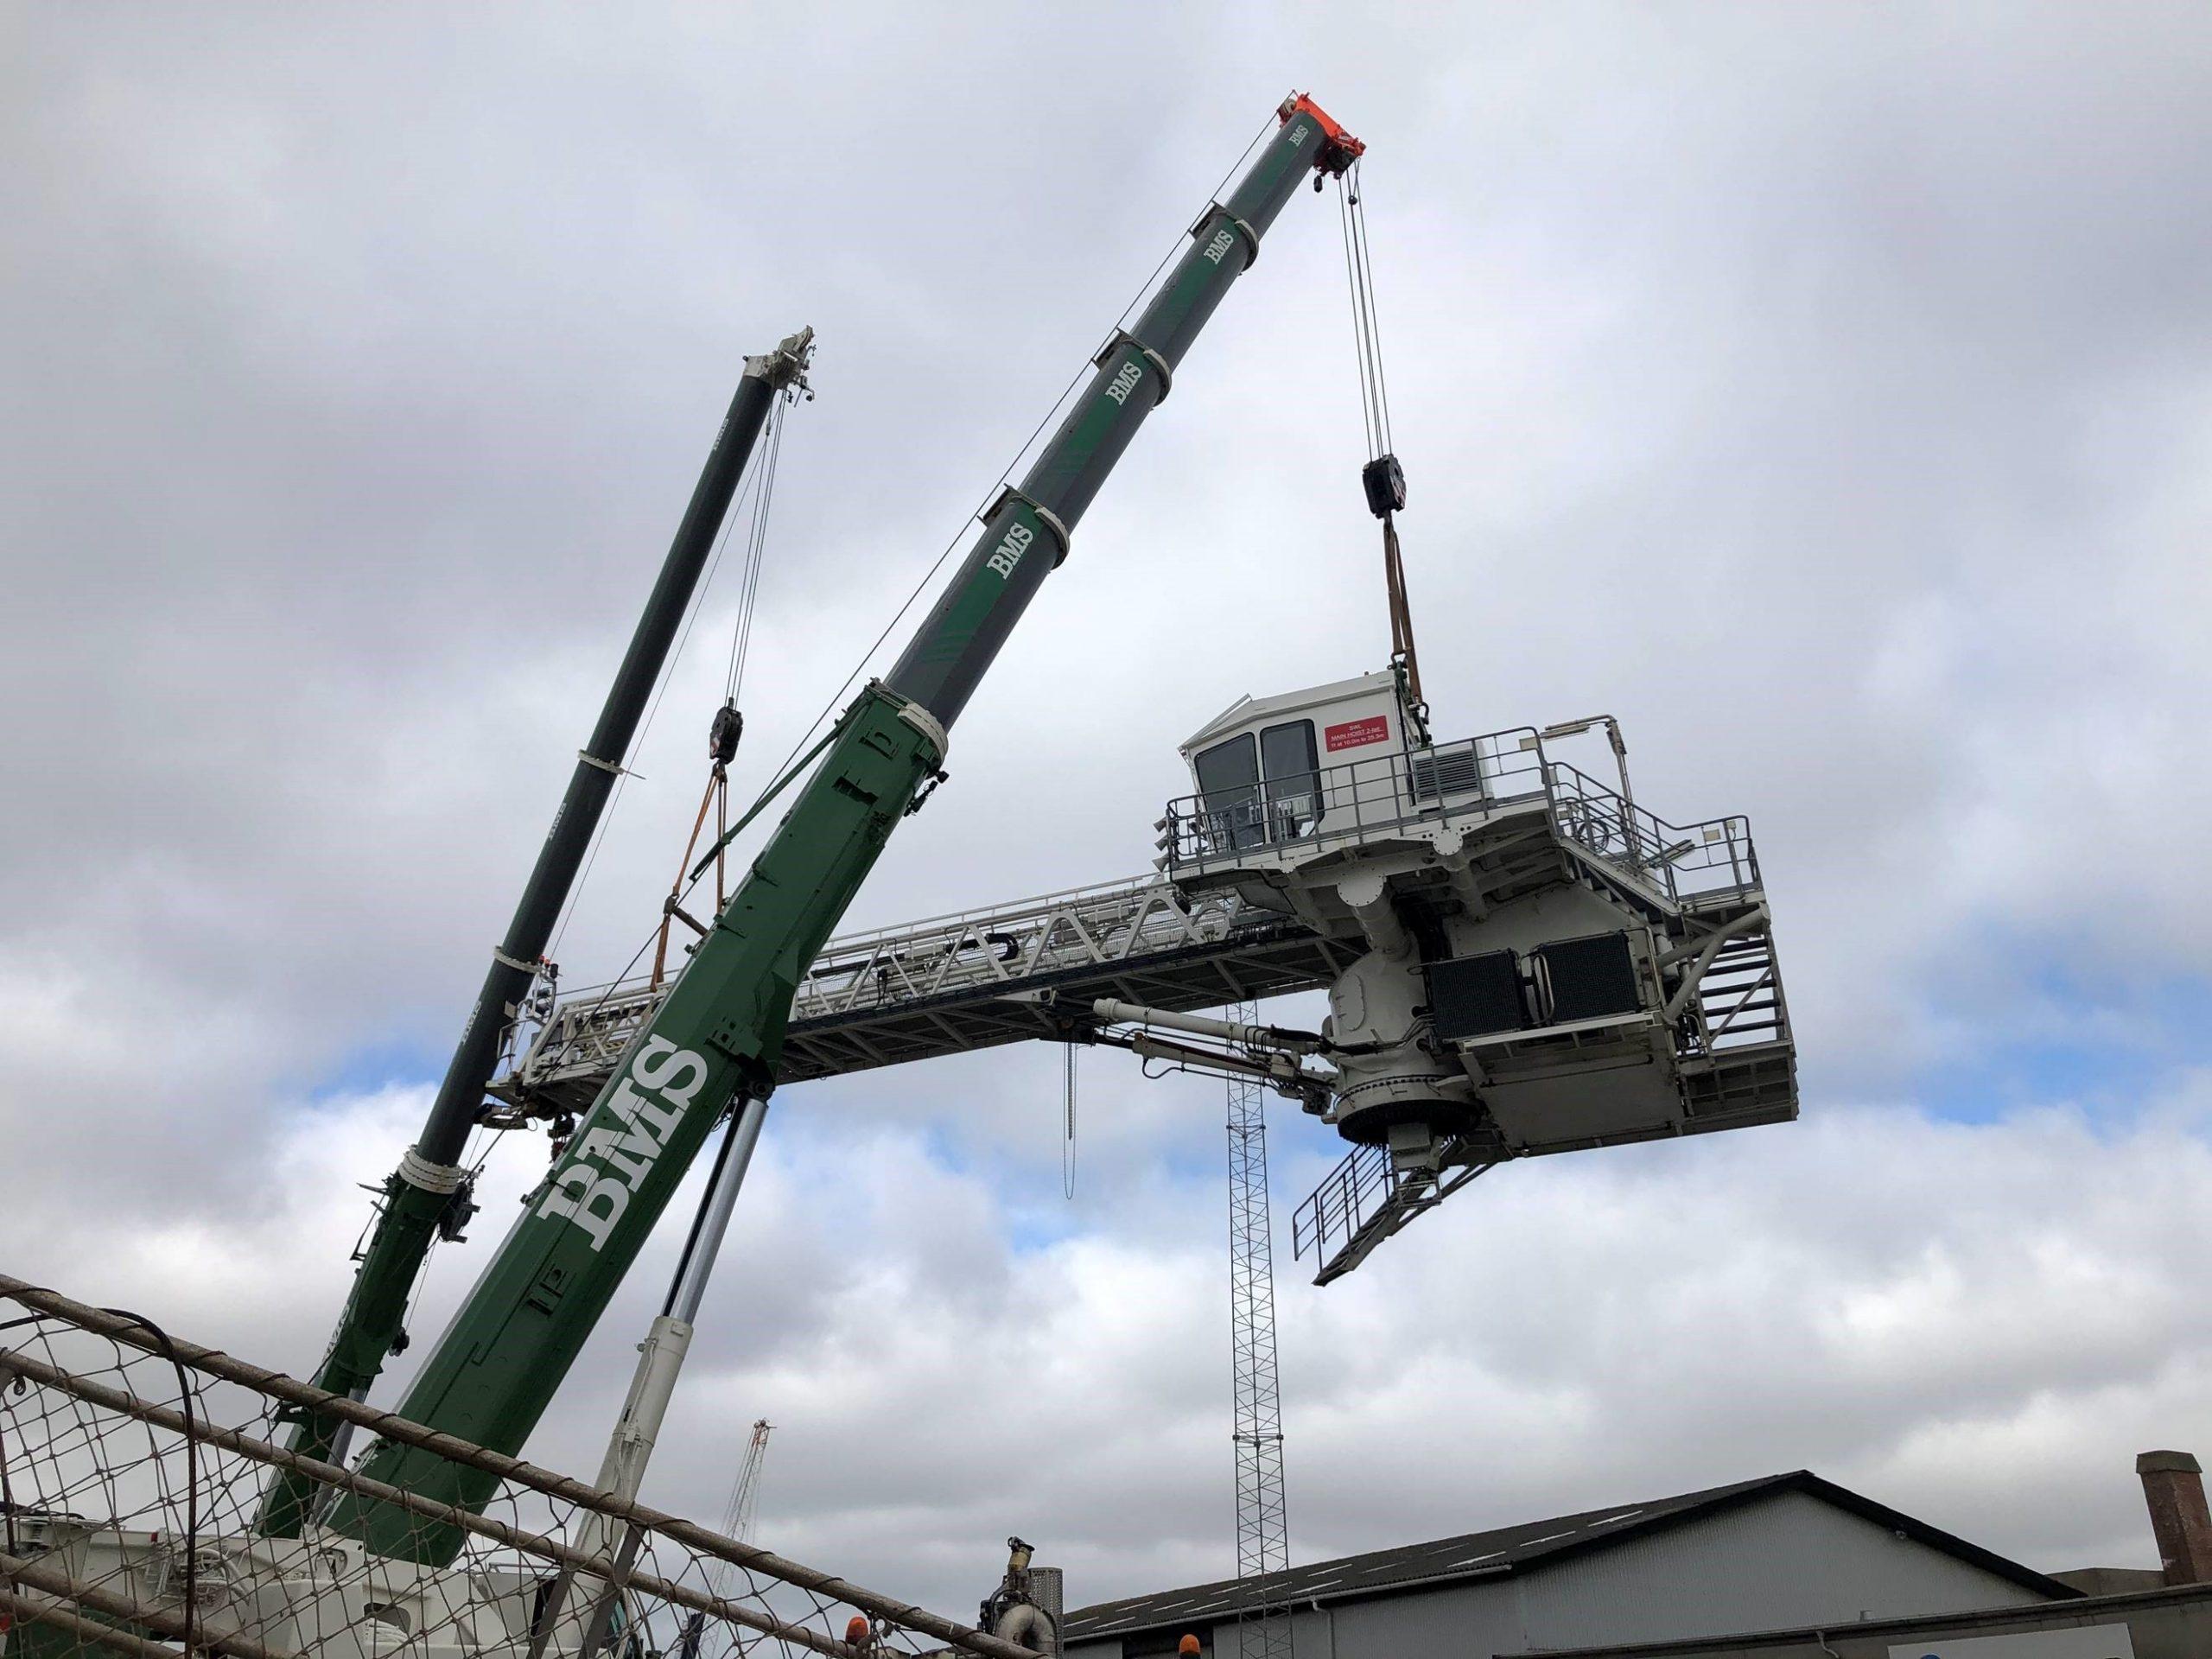 Increased pedestal installation 4.5m